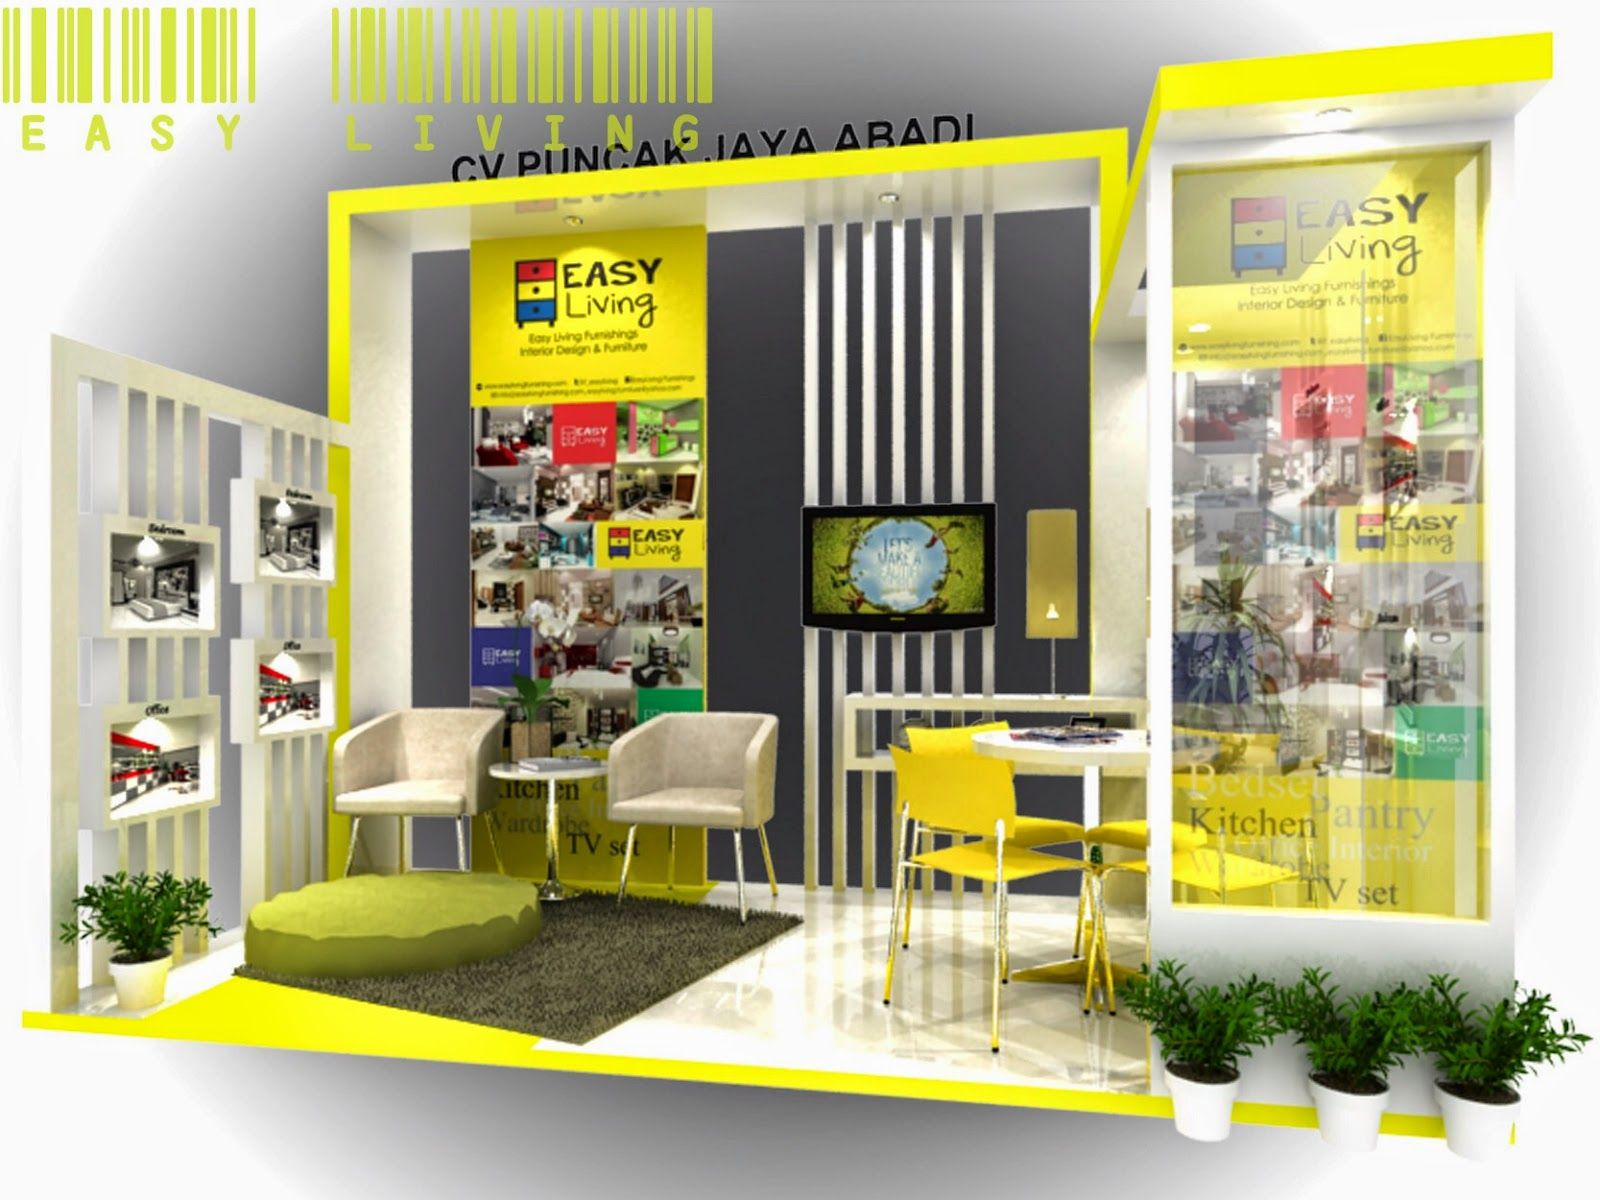 Easy Living Indonesia Desain Booth Pameran Easy Living Indonesia Inter Interior Desain Interior Desain Furnitur